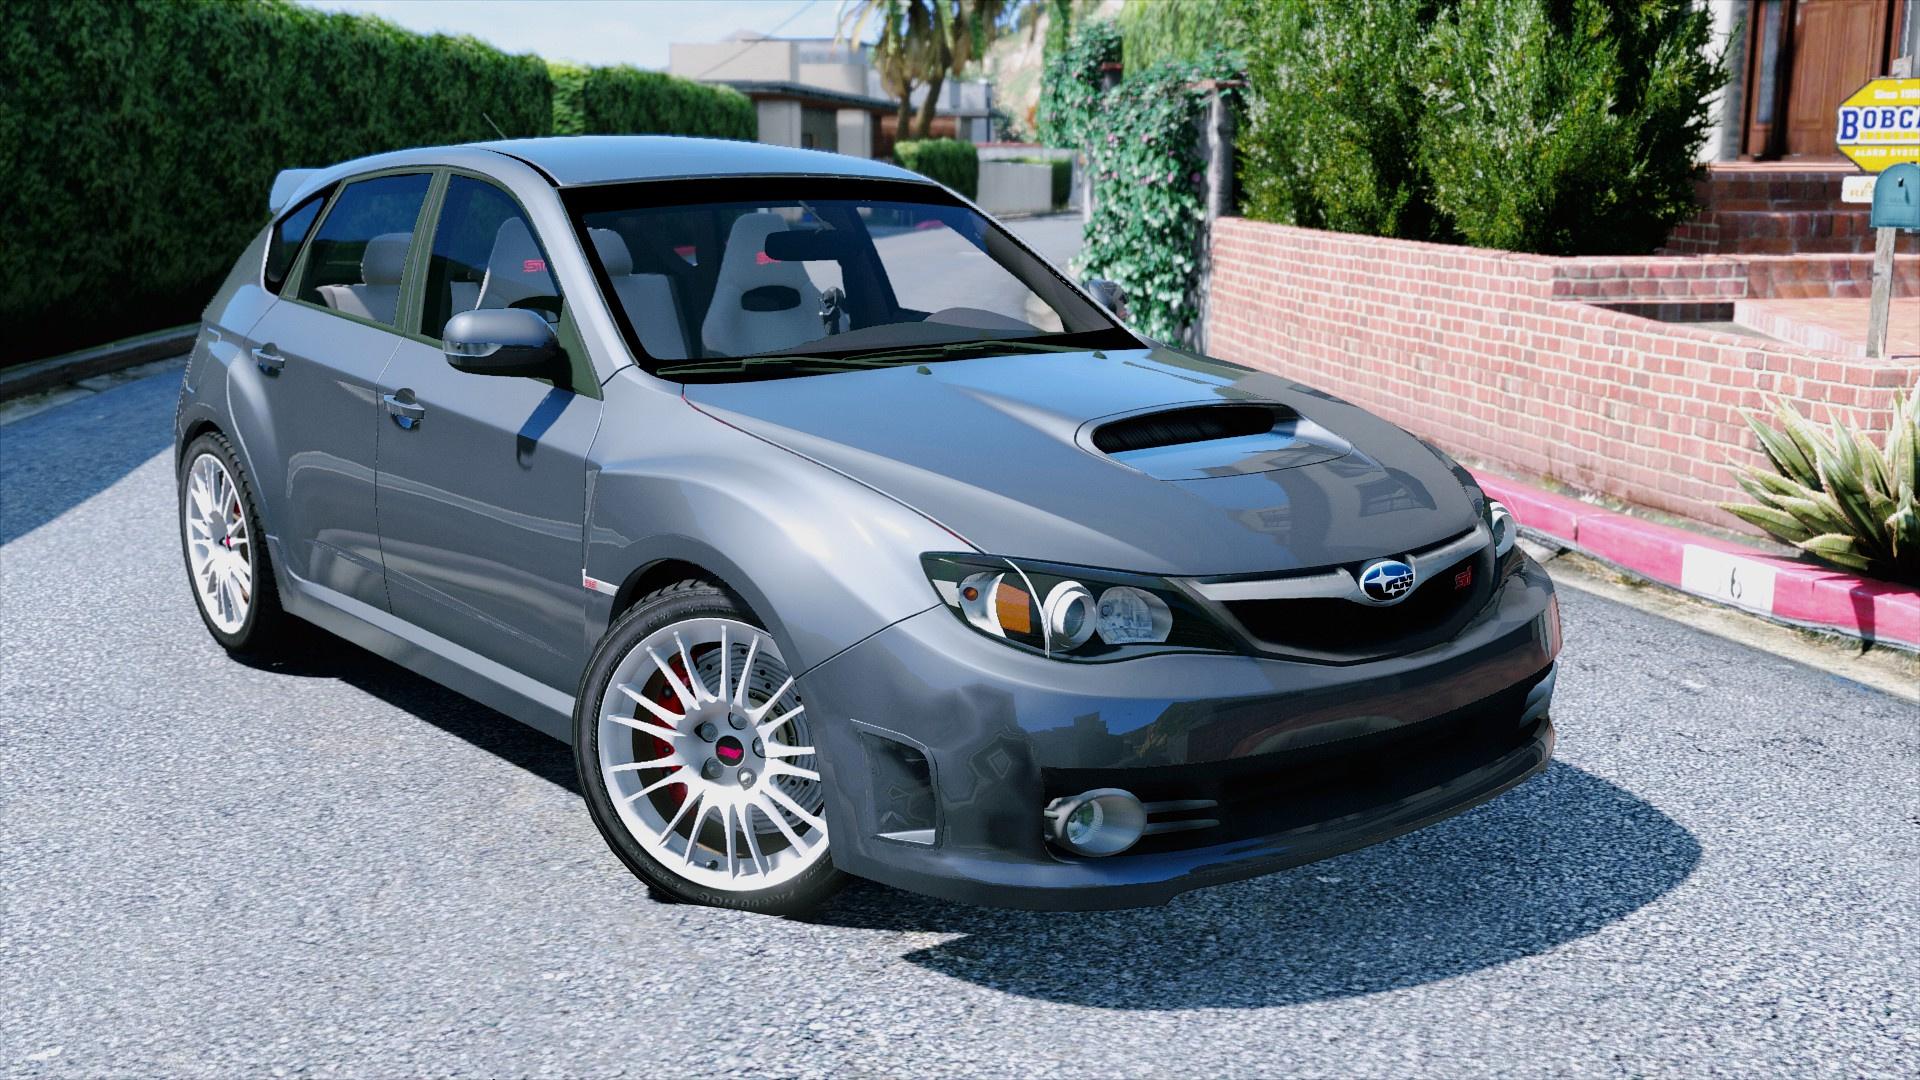 Latest GTA 5 Mods - Subaru - GTA5-Mods com